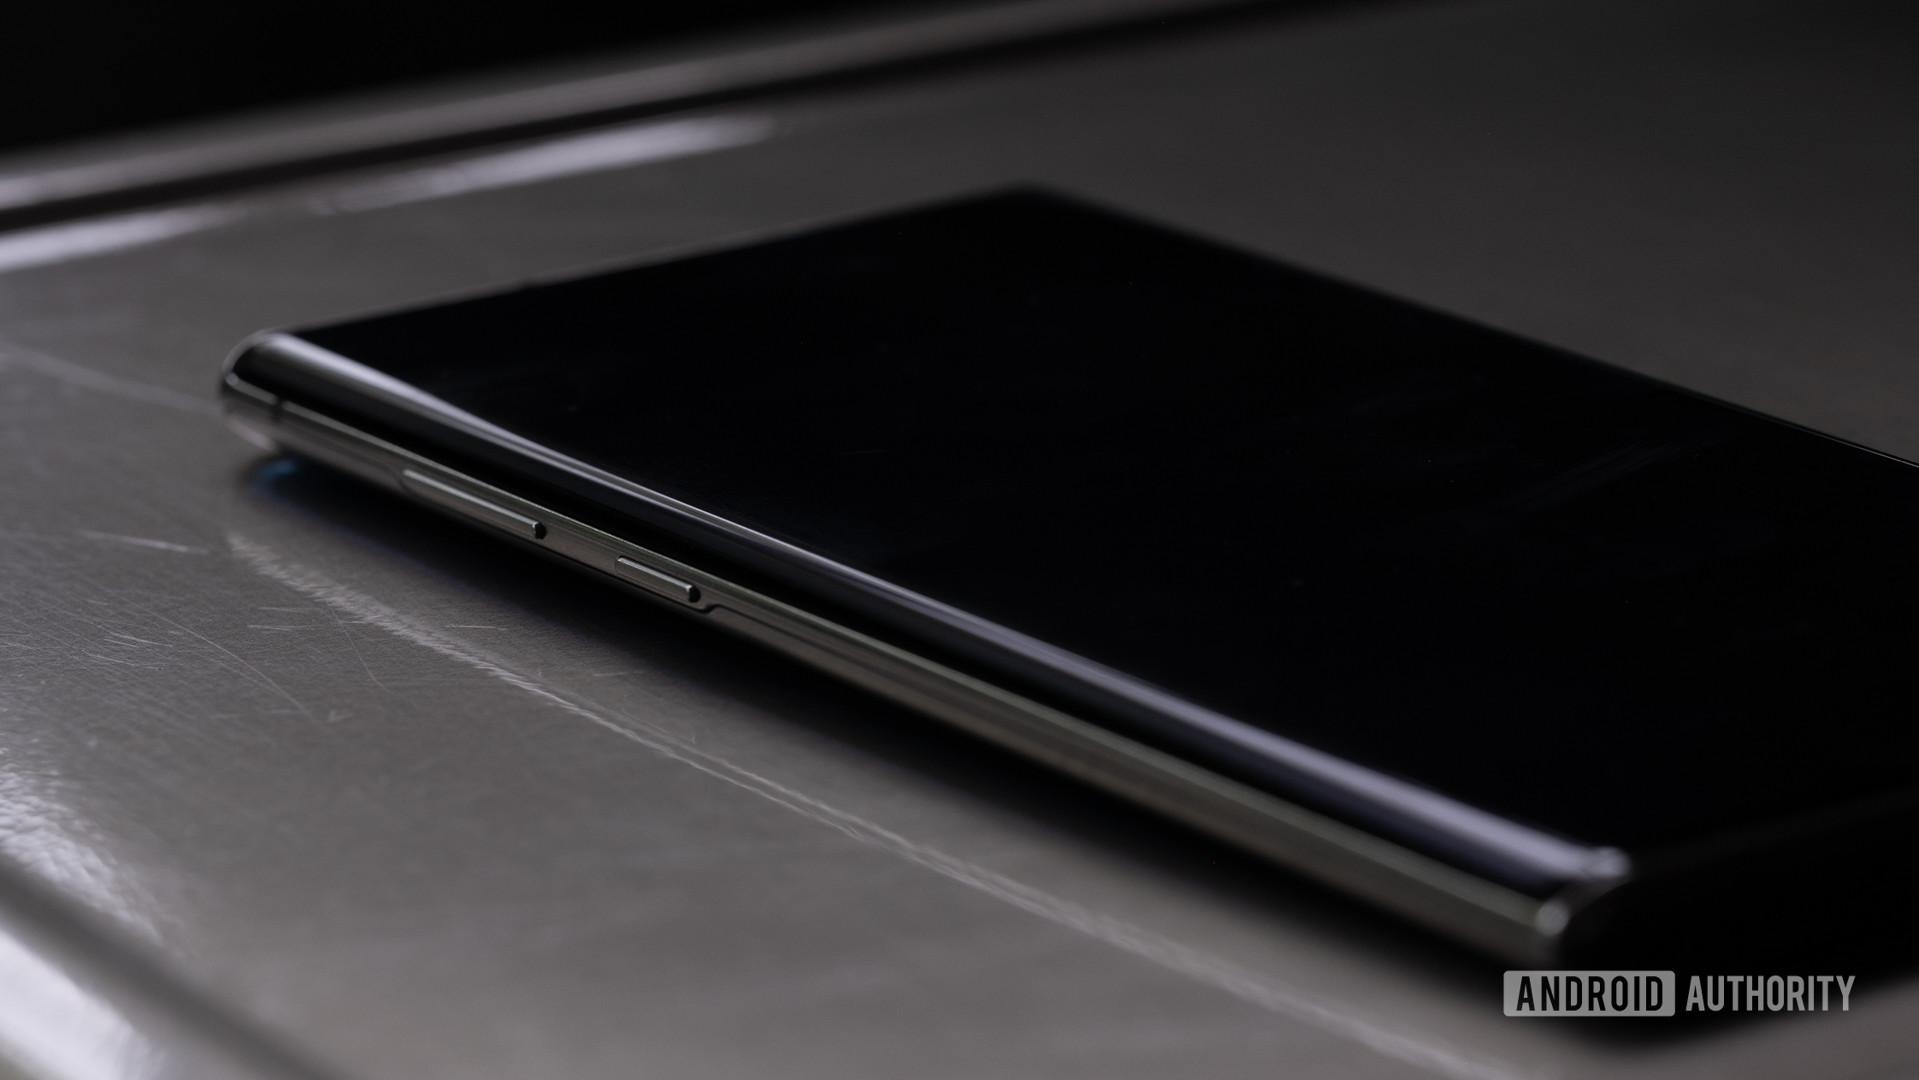 Samsung Galaxy Note 10 Plus side macro